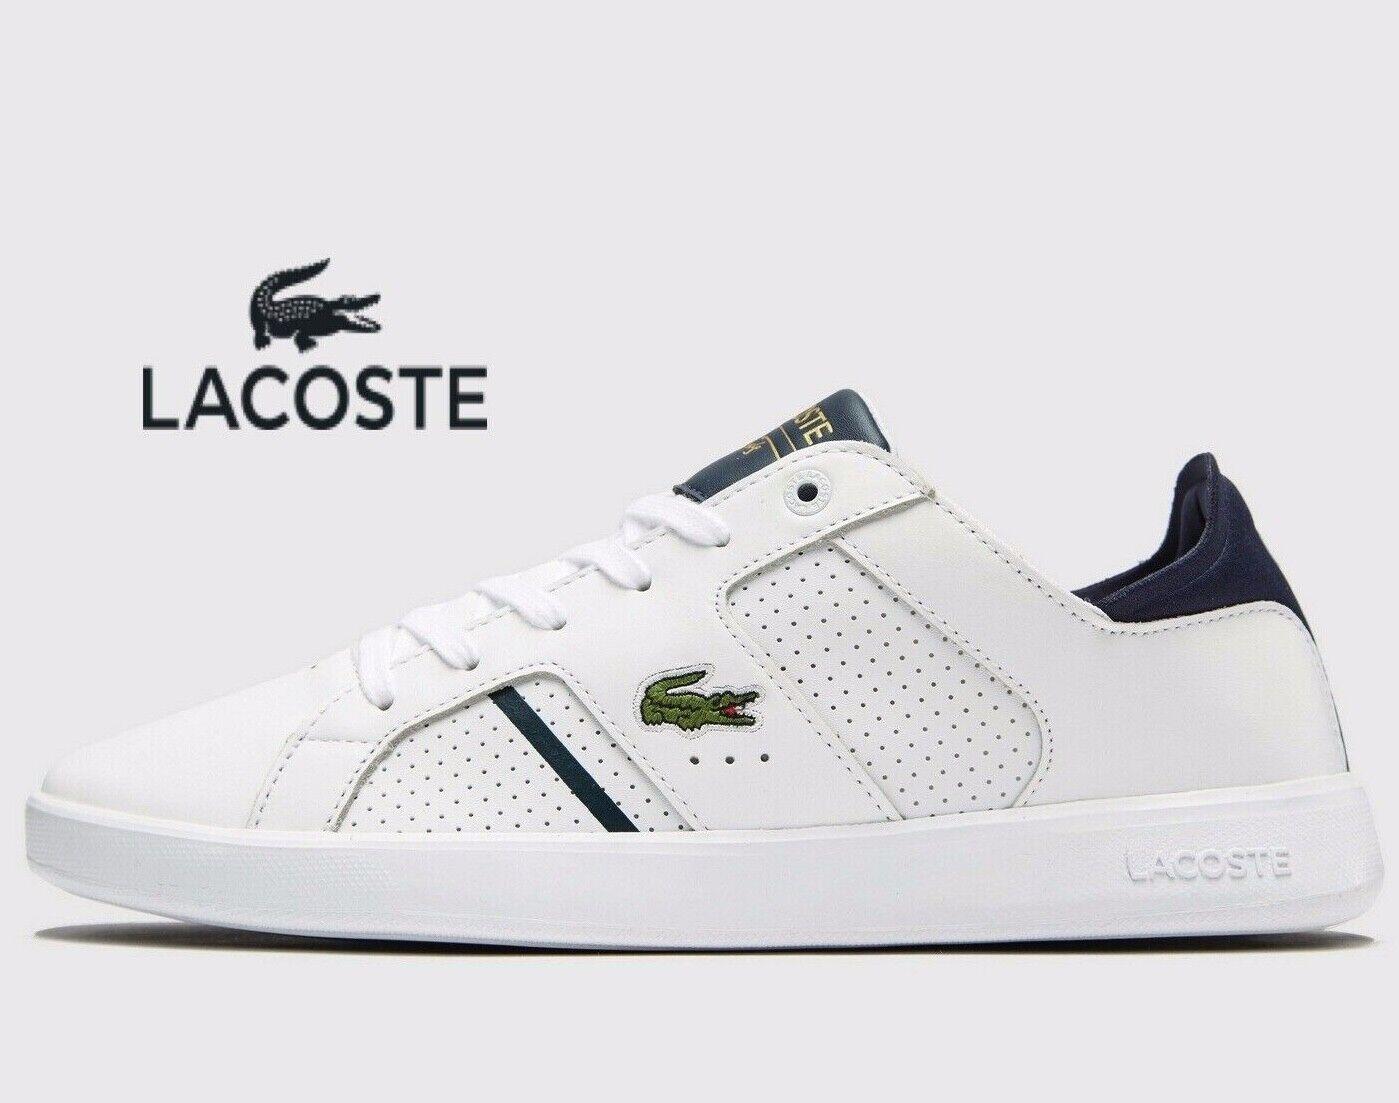 Latest Lacoste Novas CT 118 1 Cuero ® (Hombres Tallas Reino Unido 8 - 12) blancoo Azul Marino